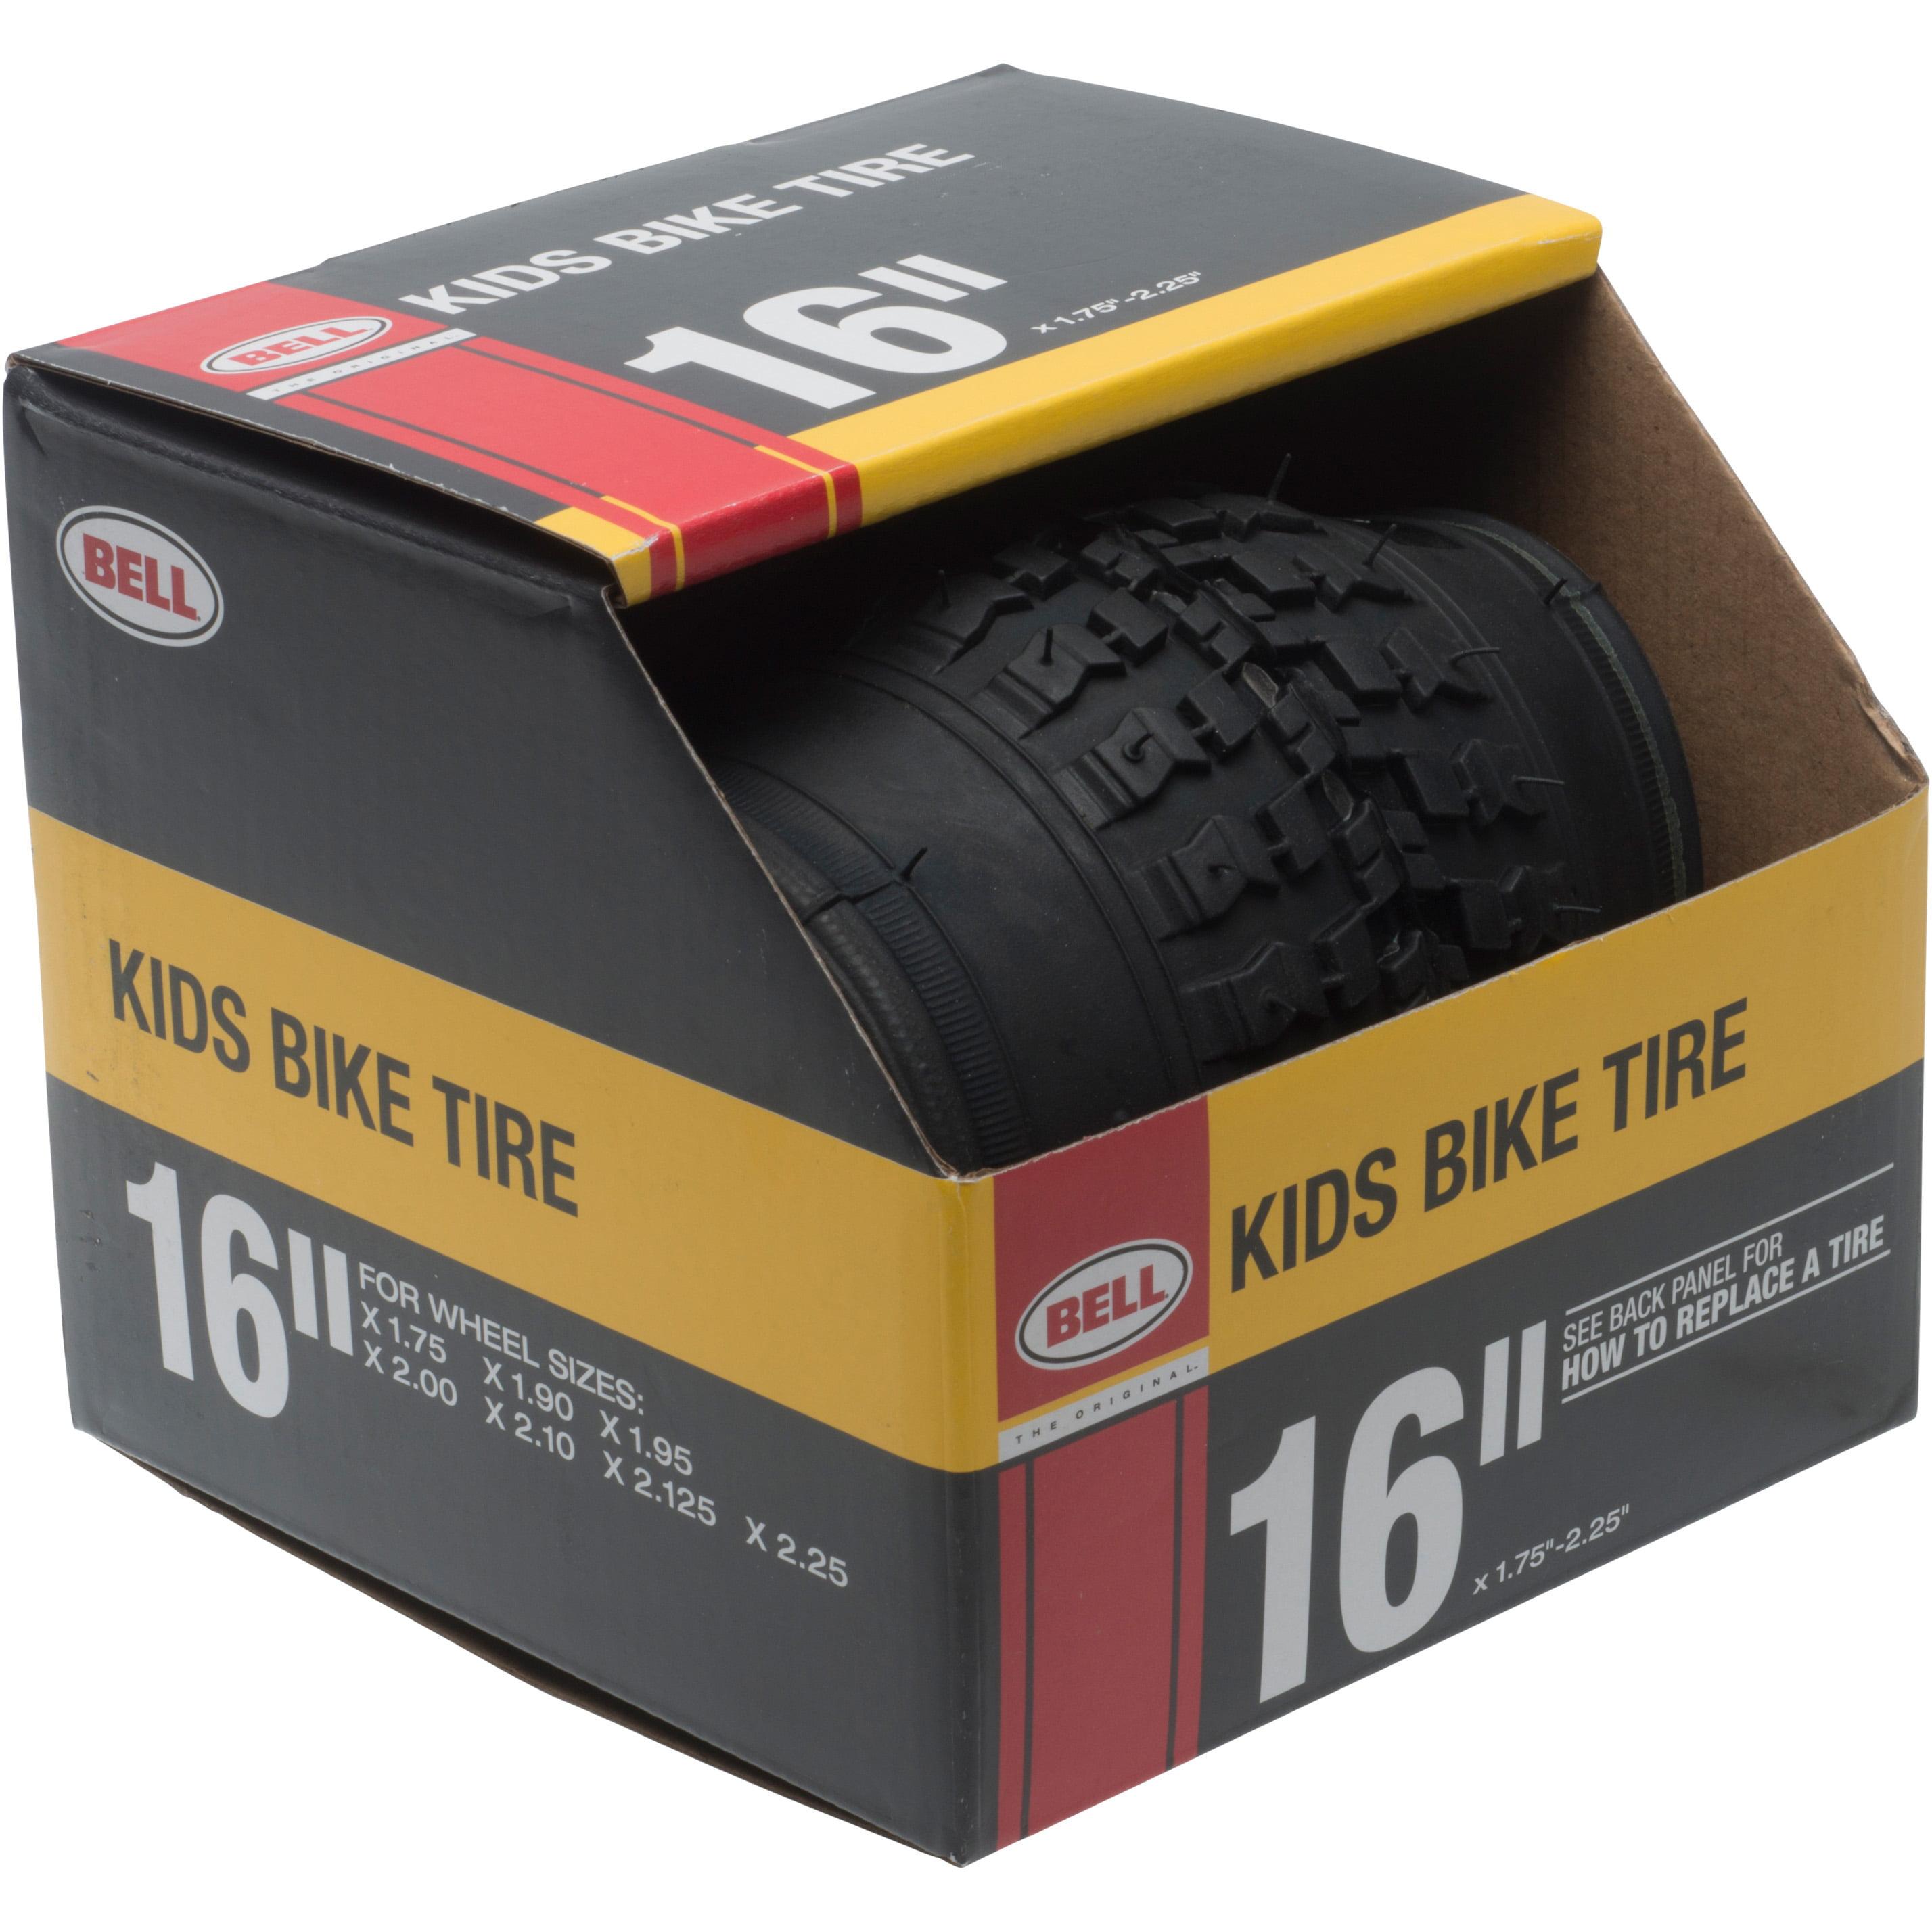 "Bell Standard Kids Bike Tire, 16"" x 1.75-2.25"", Black"